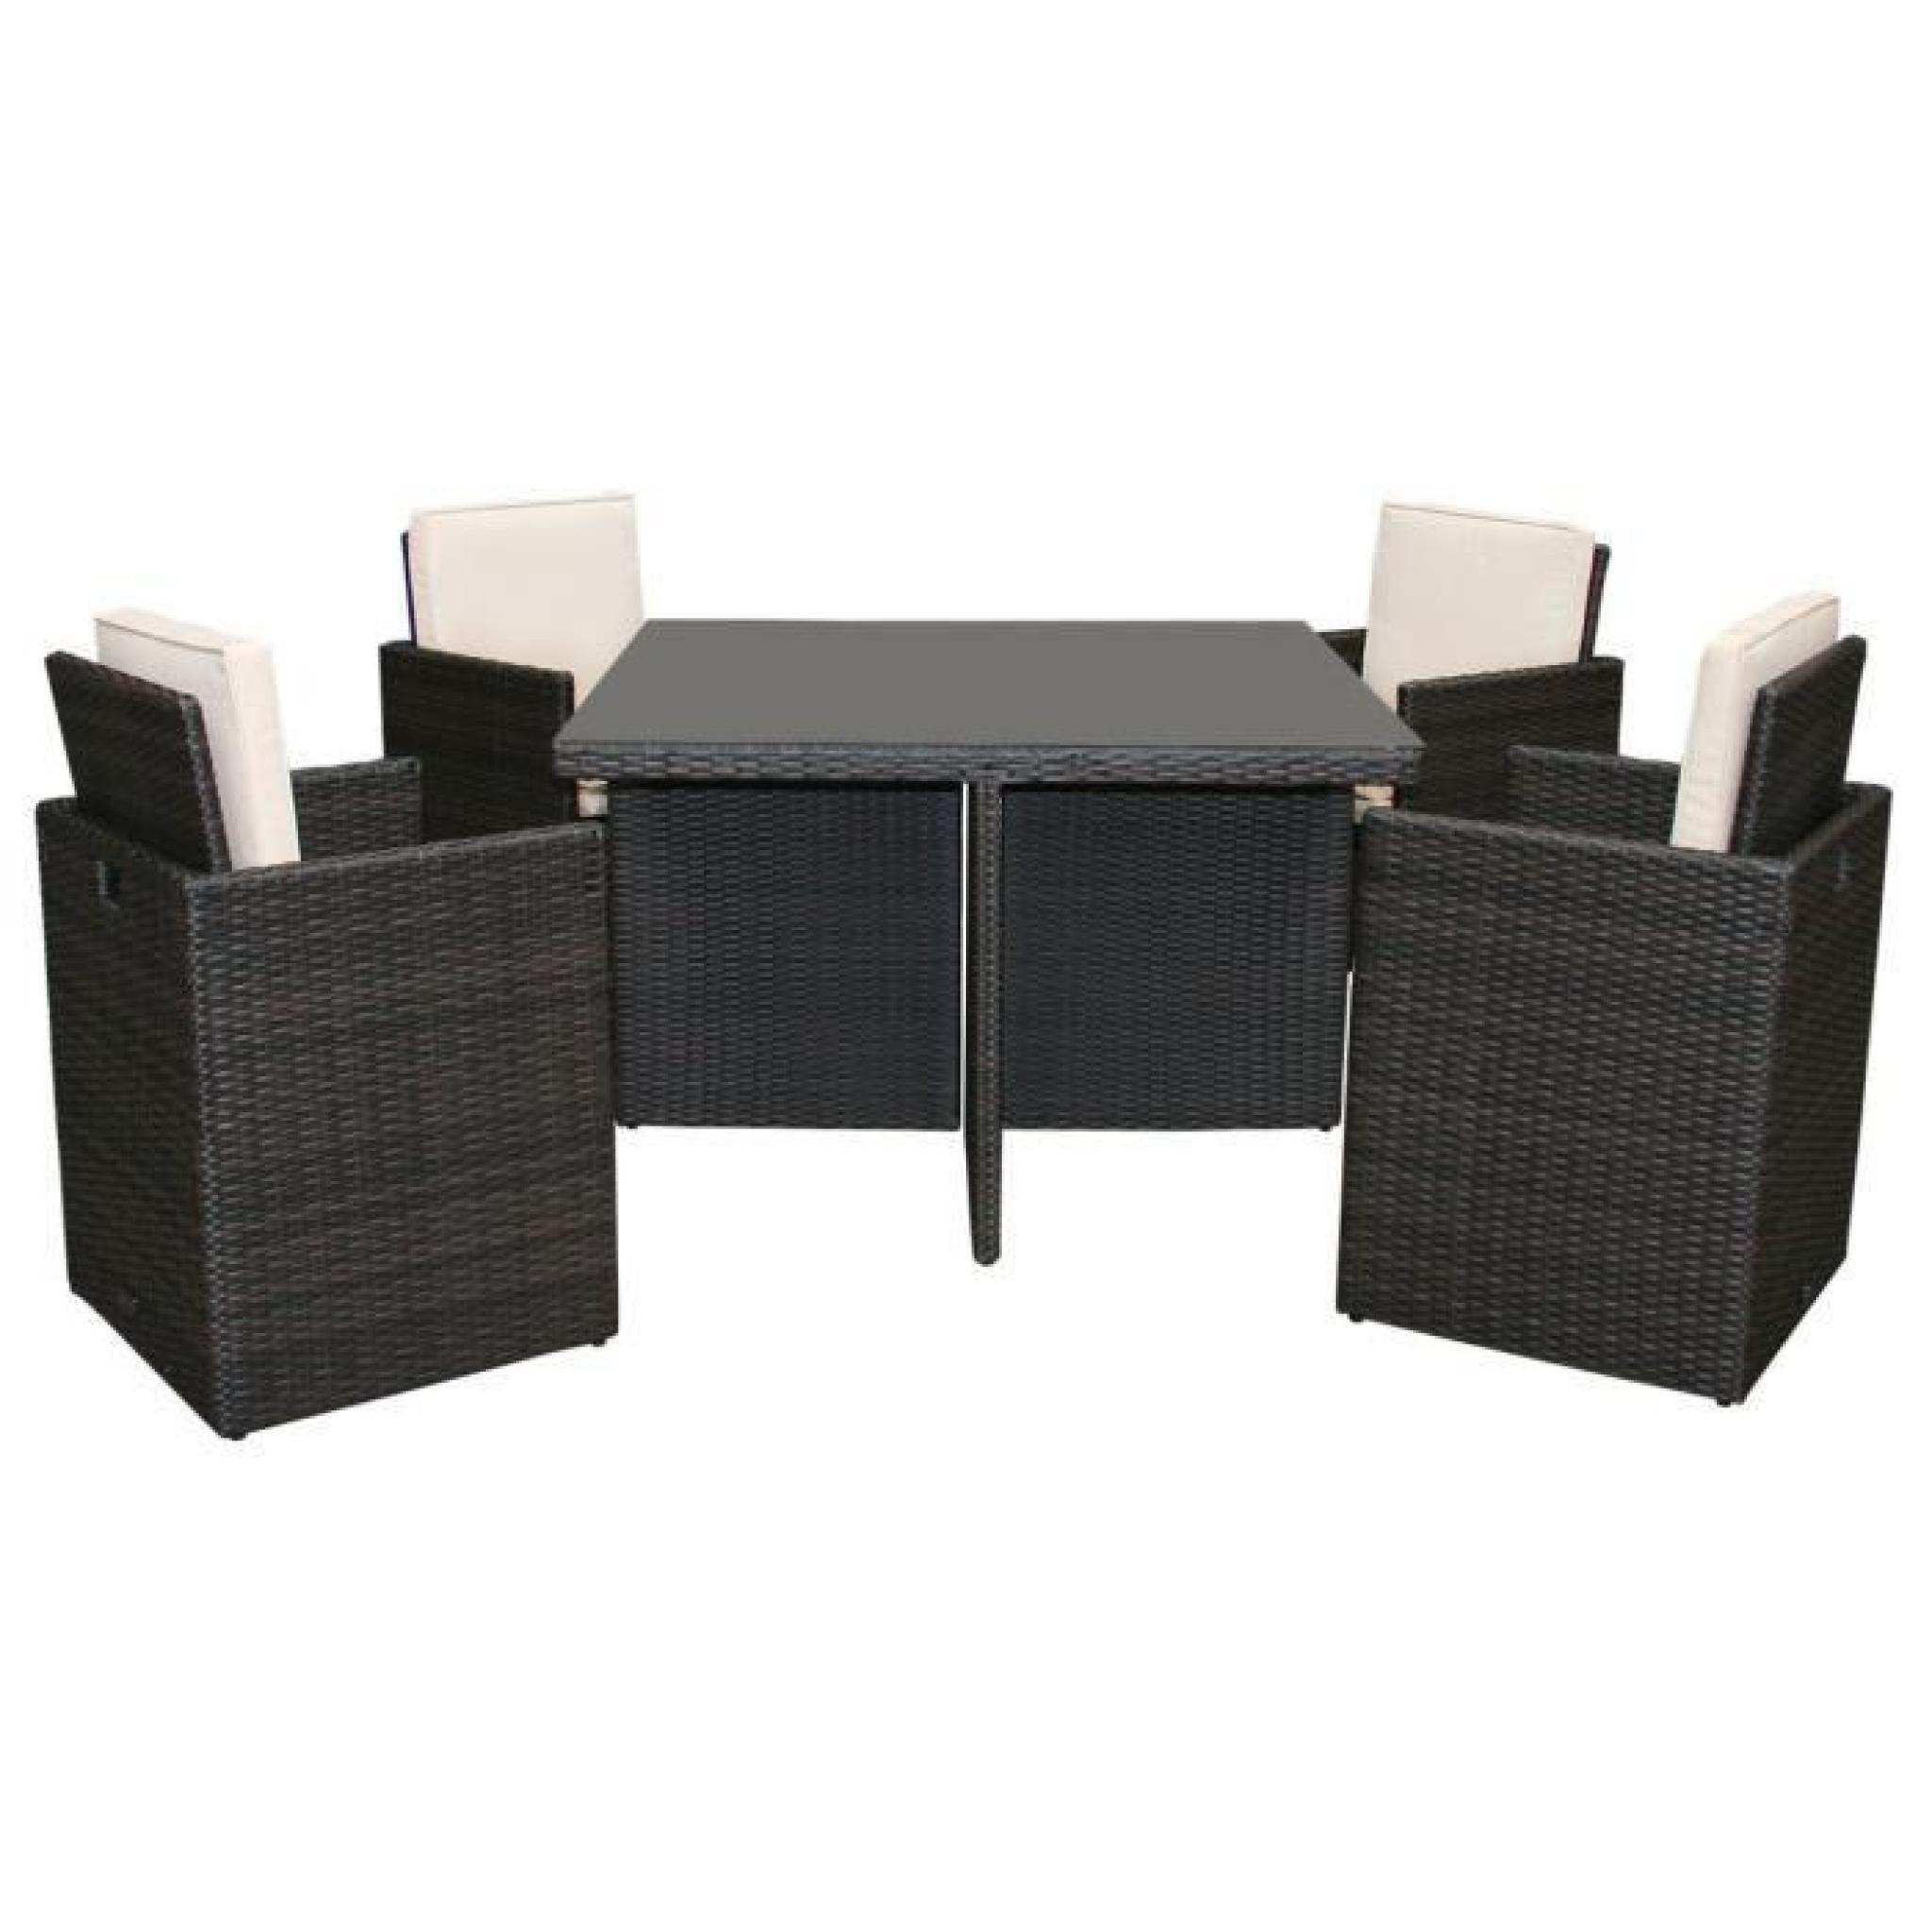 Ensemble salon de jardin - 4 chaises et 1 table - imitation rotin ...